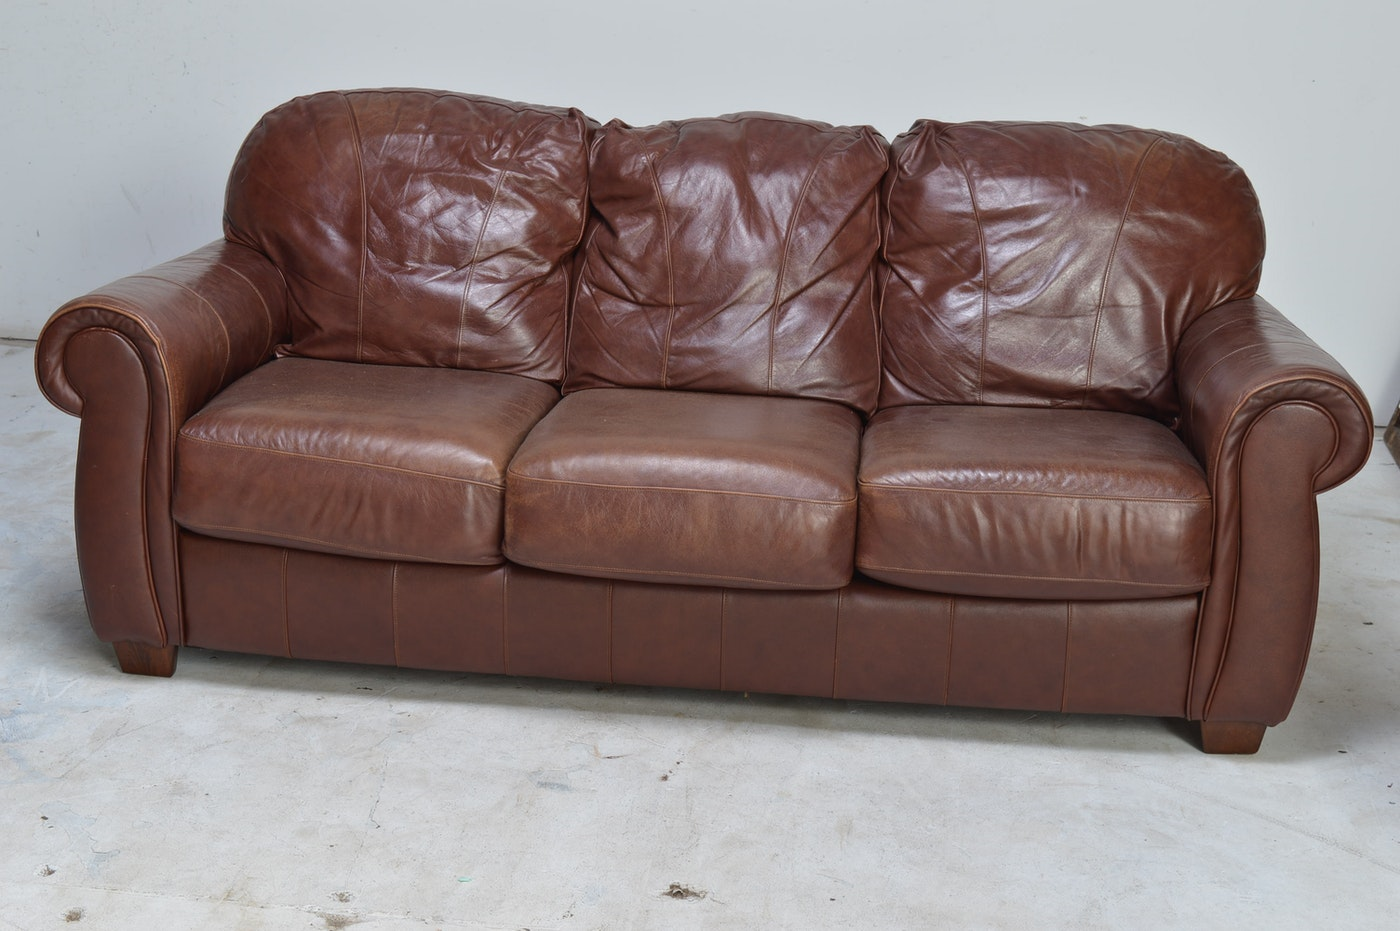 Lane Furniture Leather Sofa Or Loveseat Ebth